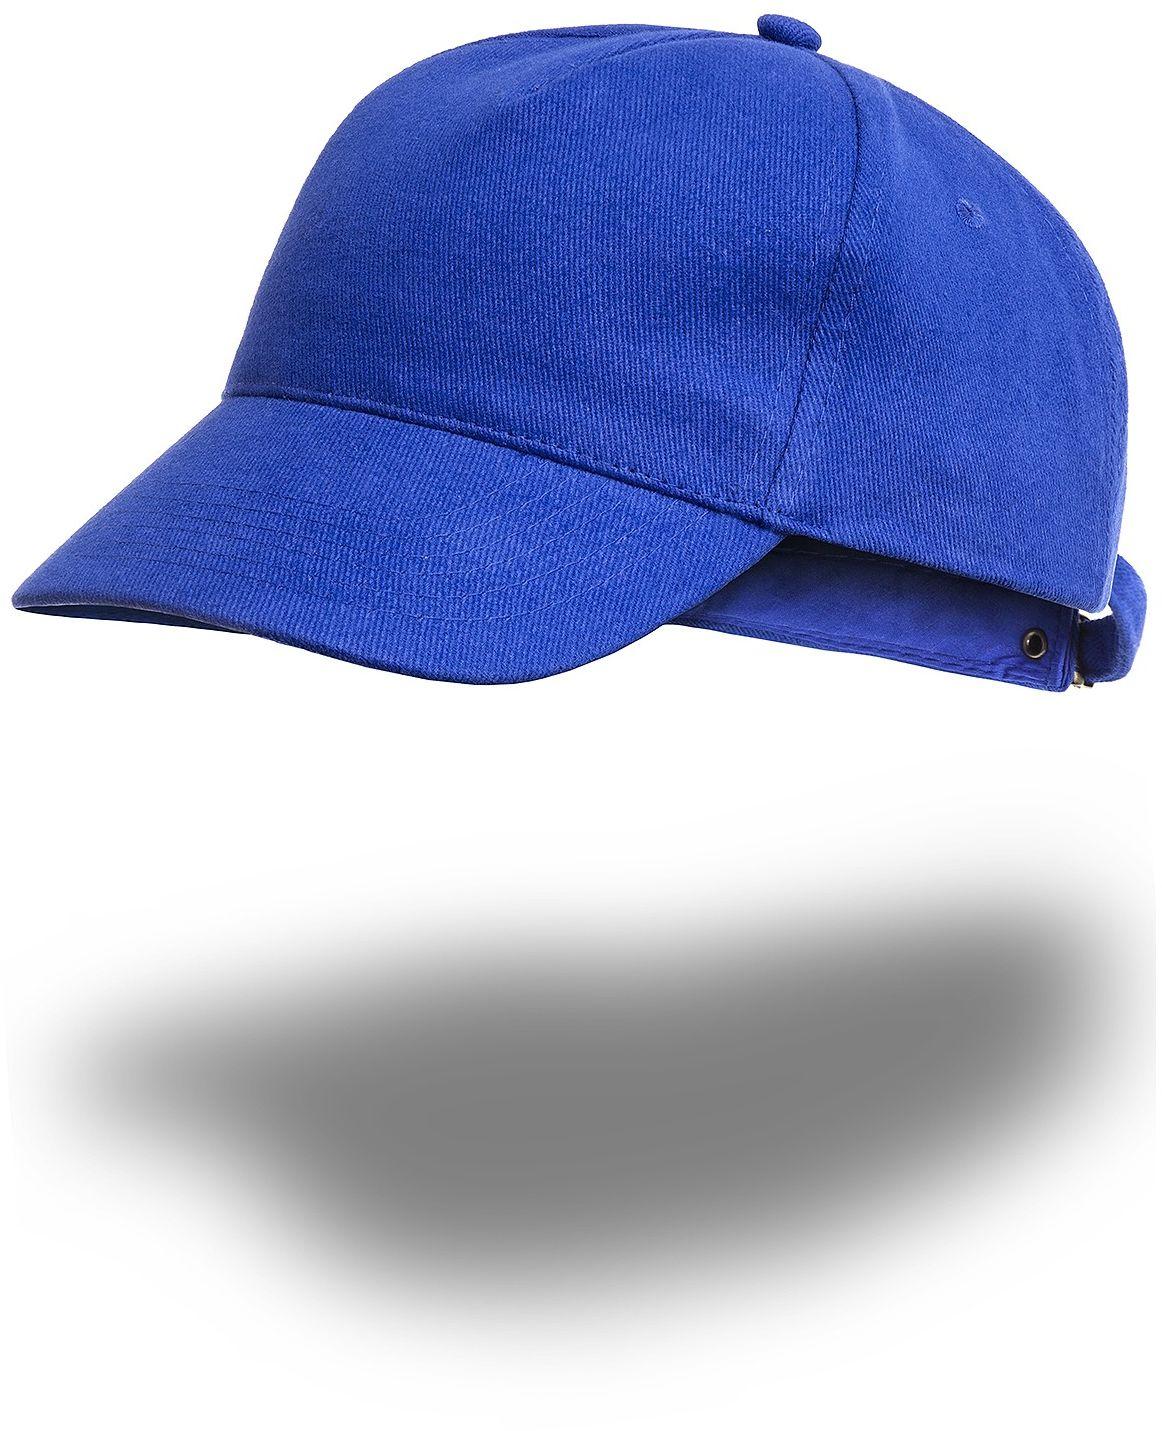 Czapka bejsbolówka - indigo